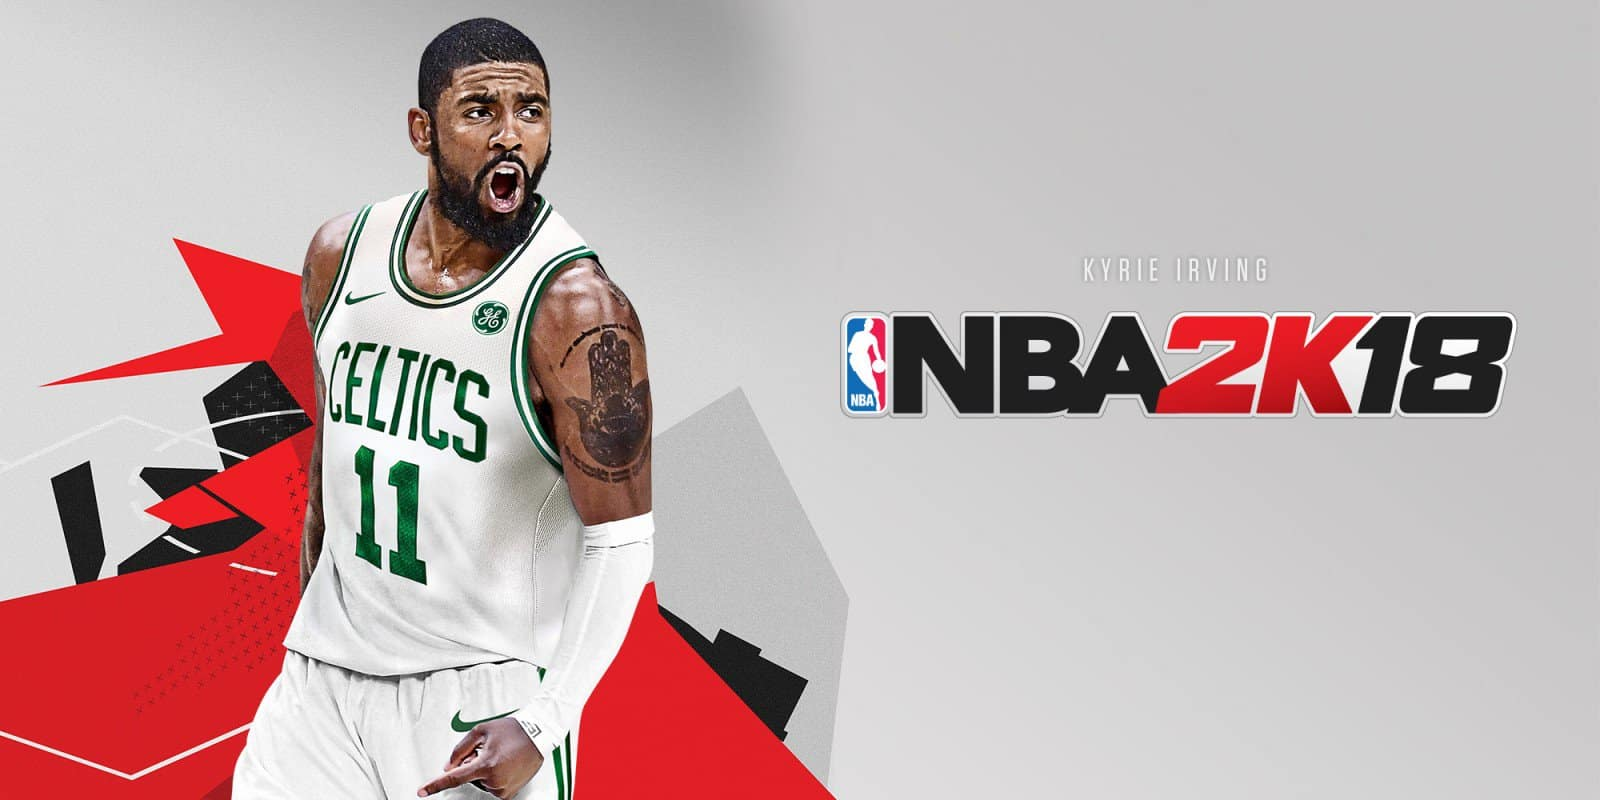 NBA 2k18 Apk iOS Latest Version Free Download